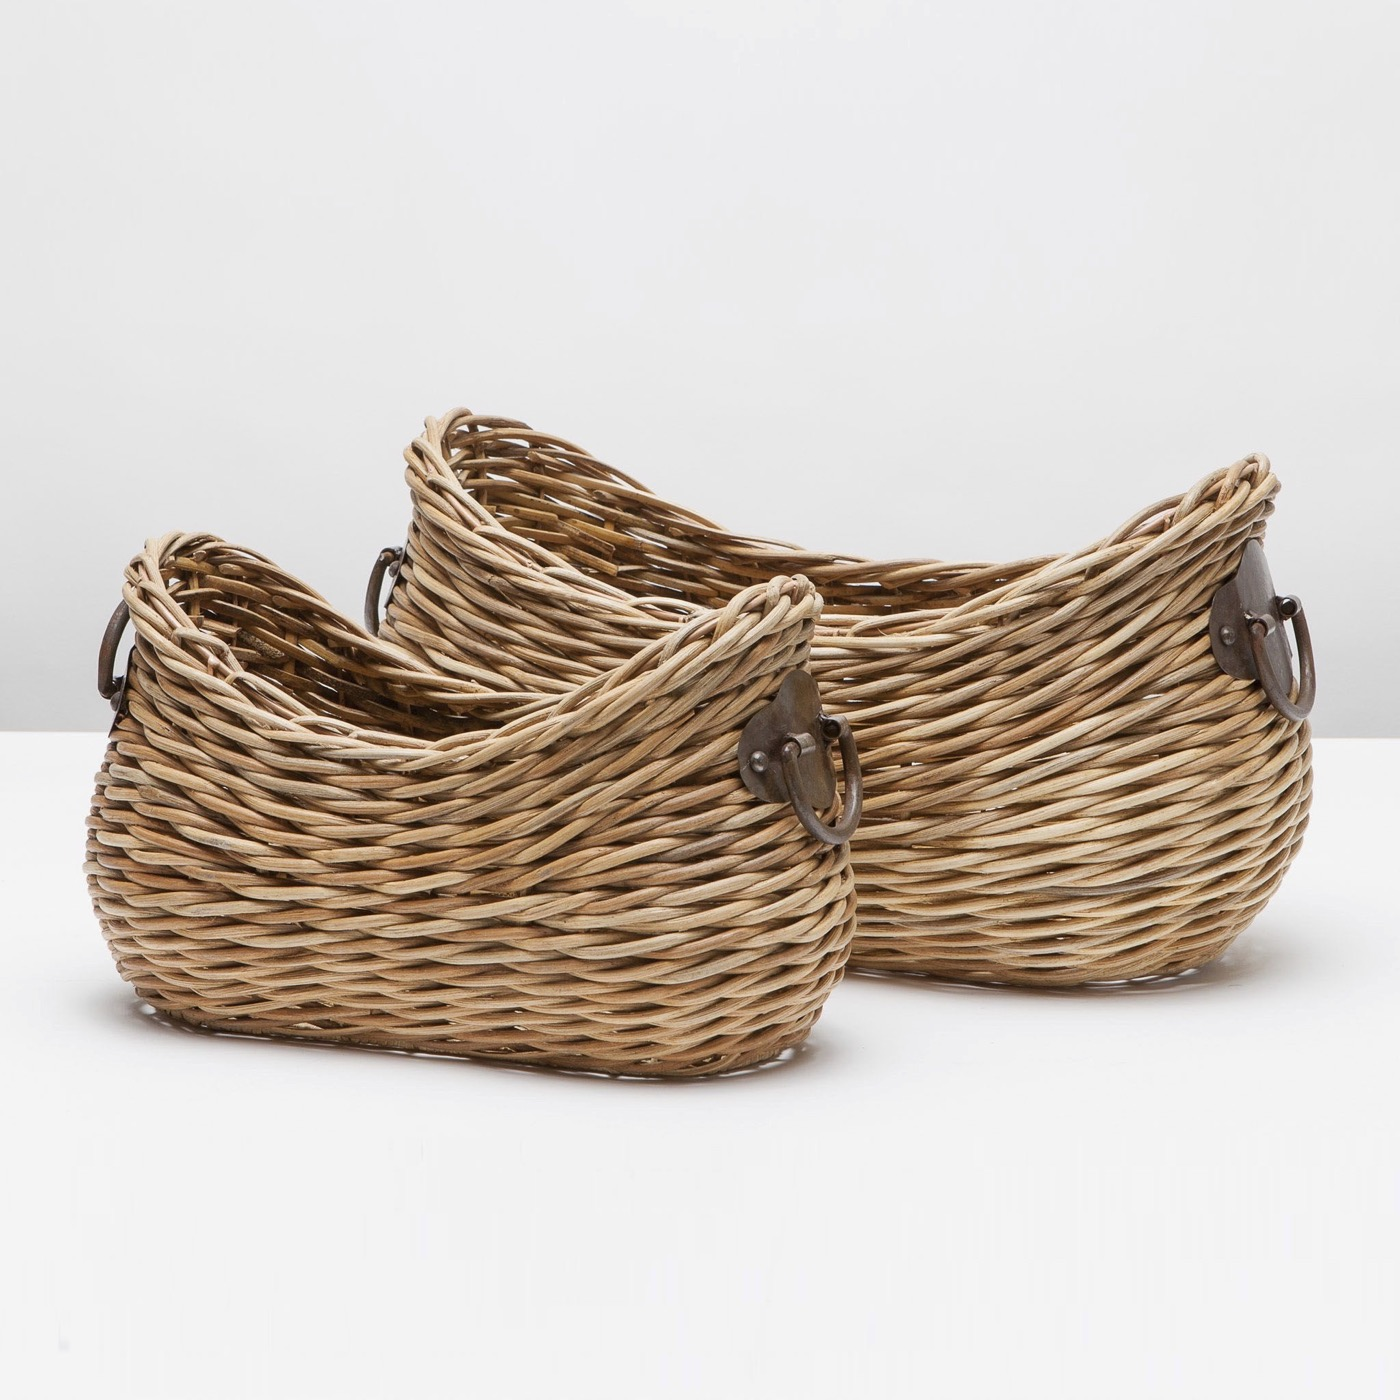 Varna Rattan Baskets Set